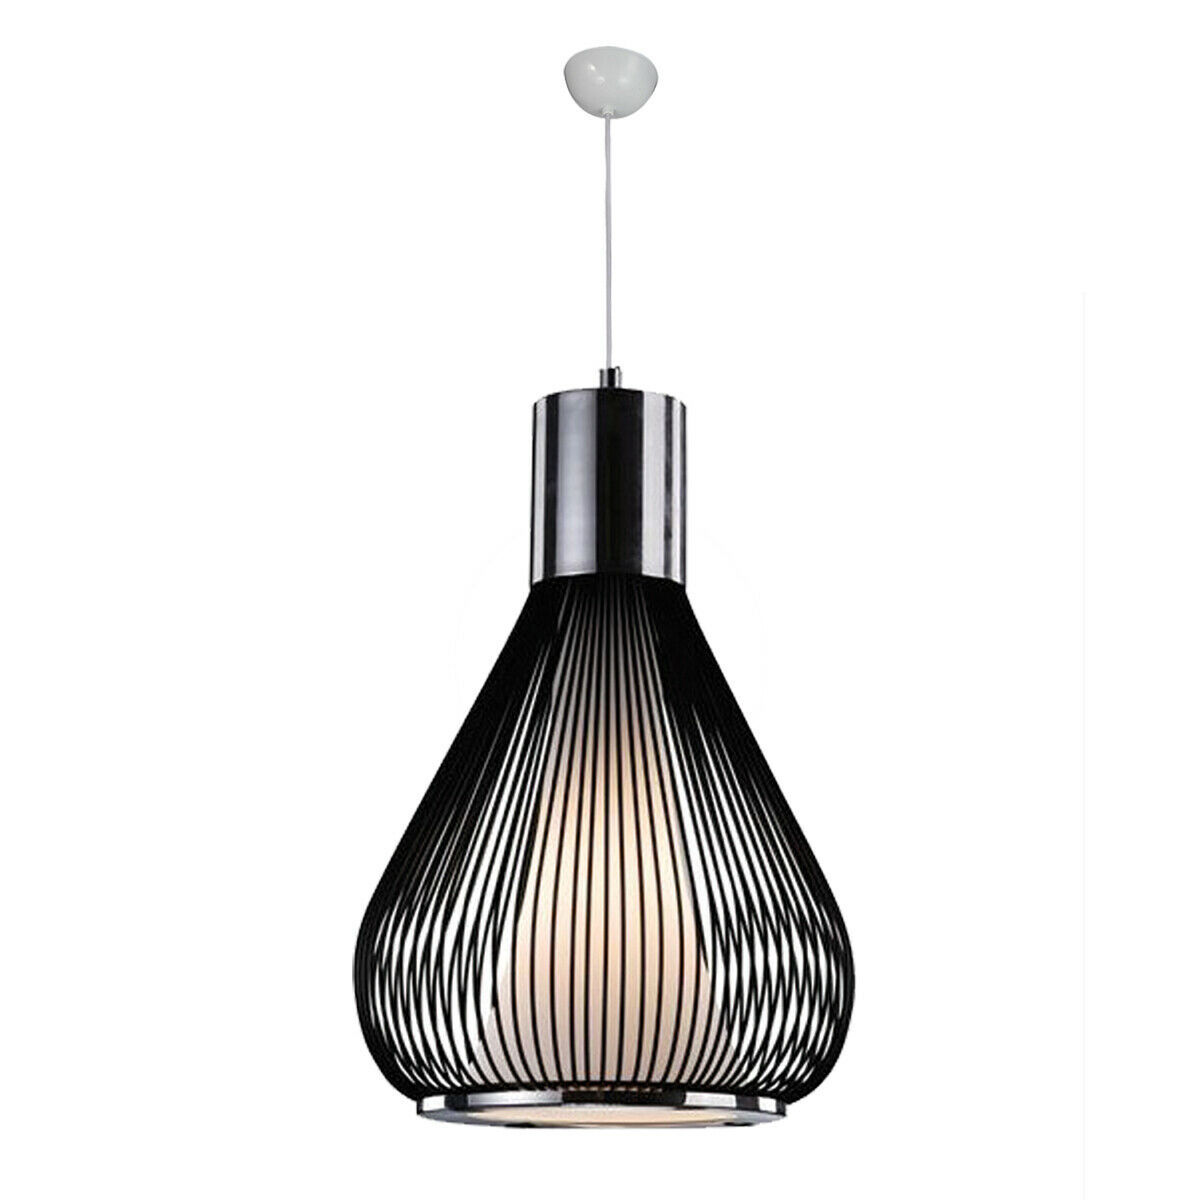 Lampadario a soffitto in metallo  Grill  Silber e schwarz 30 cm